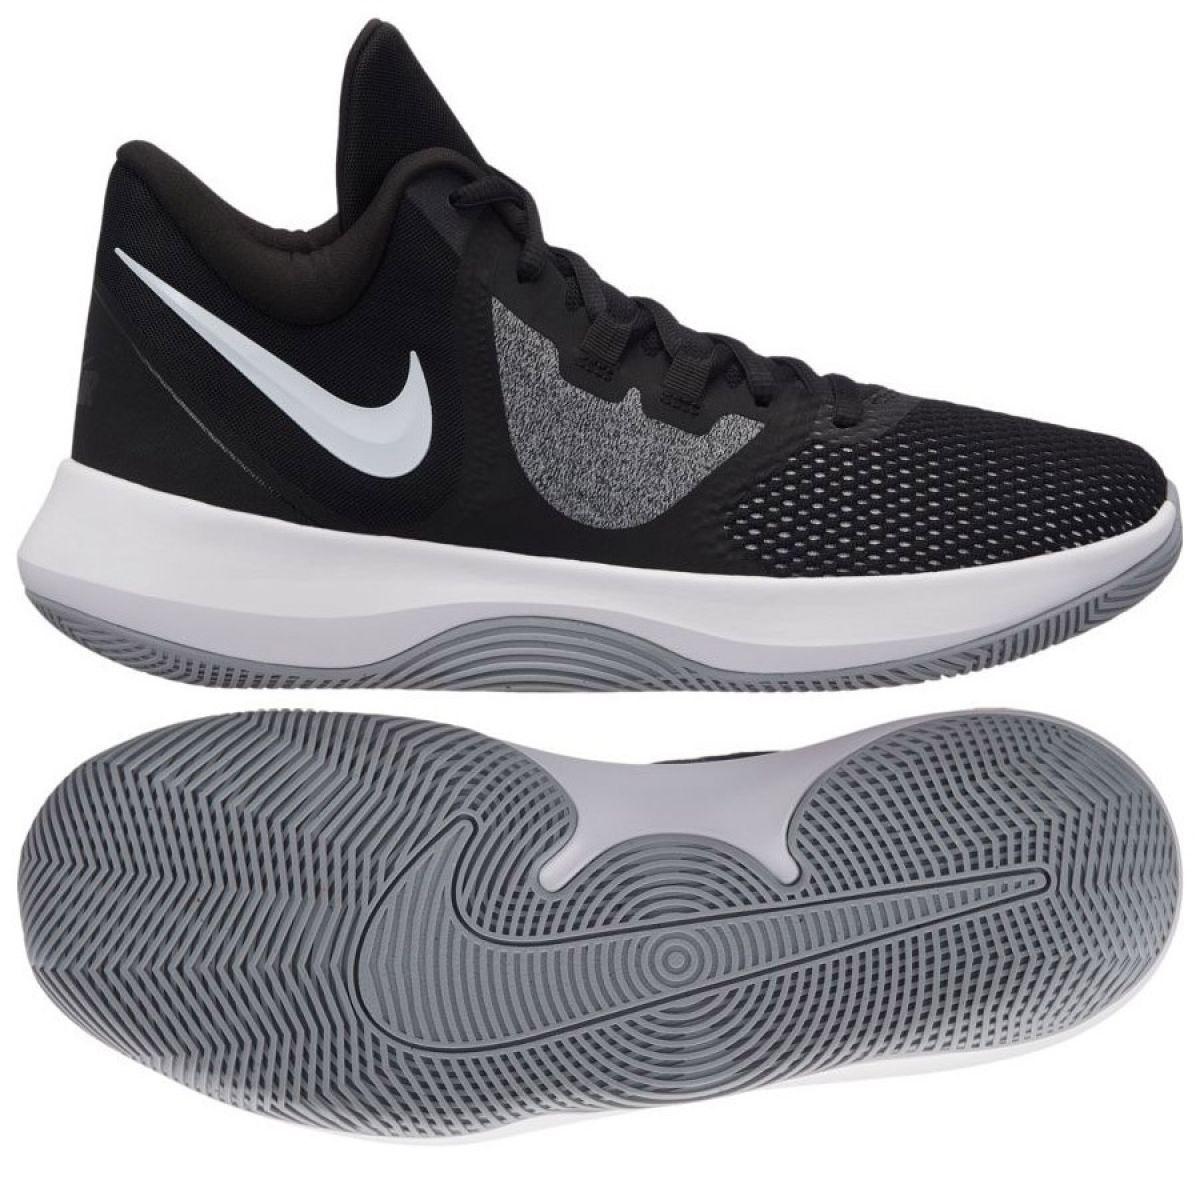 nike basketball shoes black